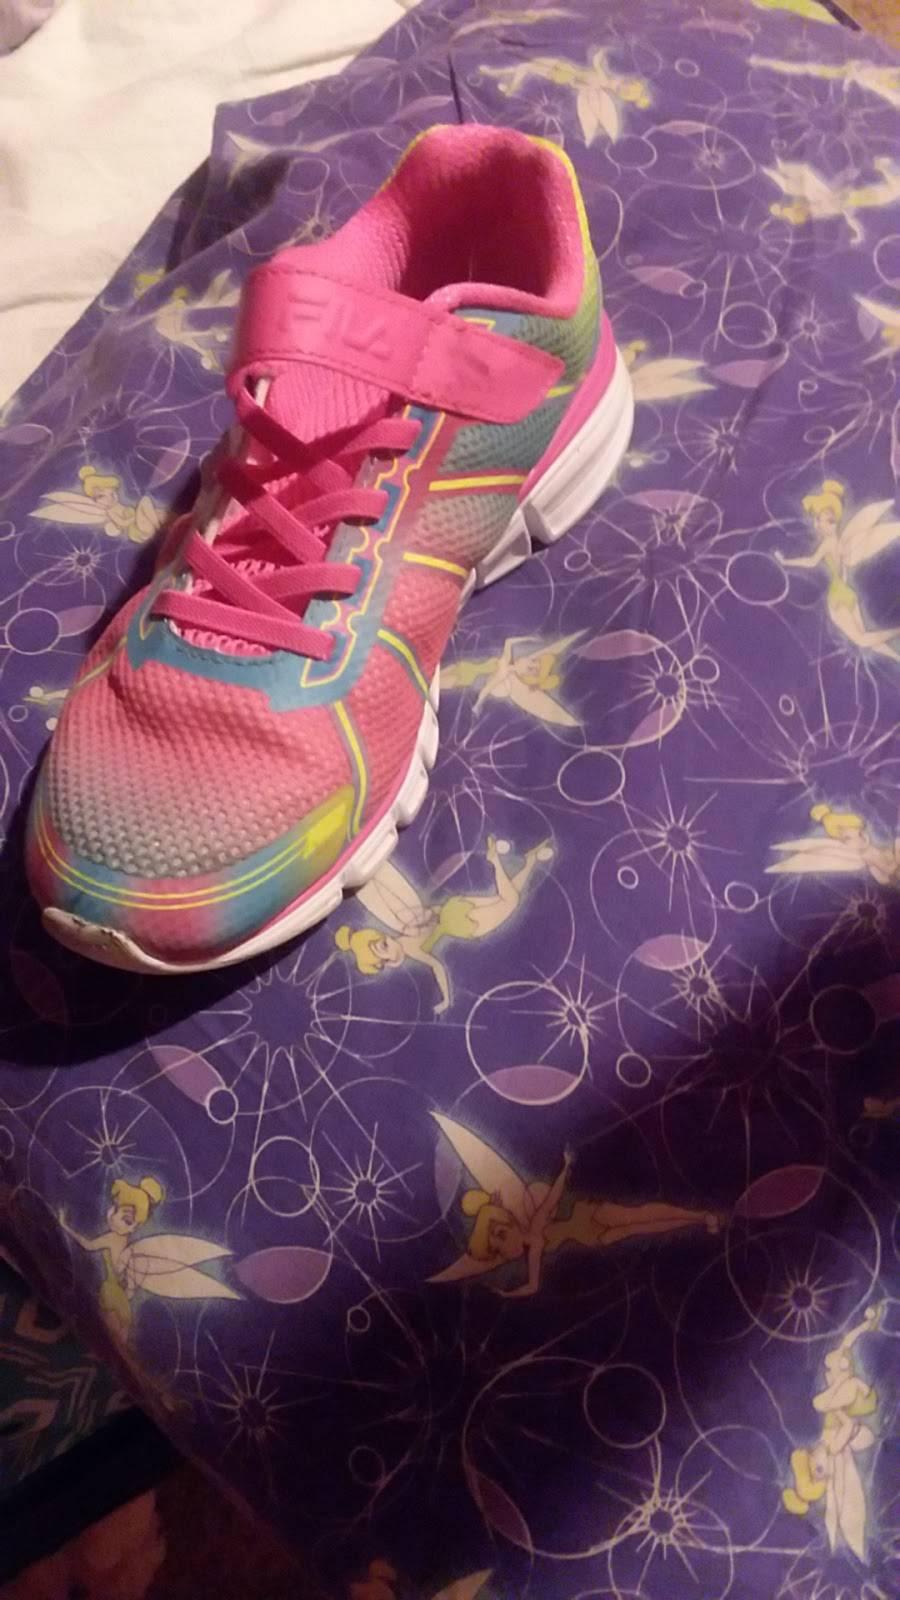 Shoe Carnival - shoe store  | Photo 8 of 8 | Address: 12313 E 96th St N, Owasso, OK 74055, USA | Phone: (918) 376-2918